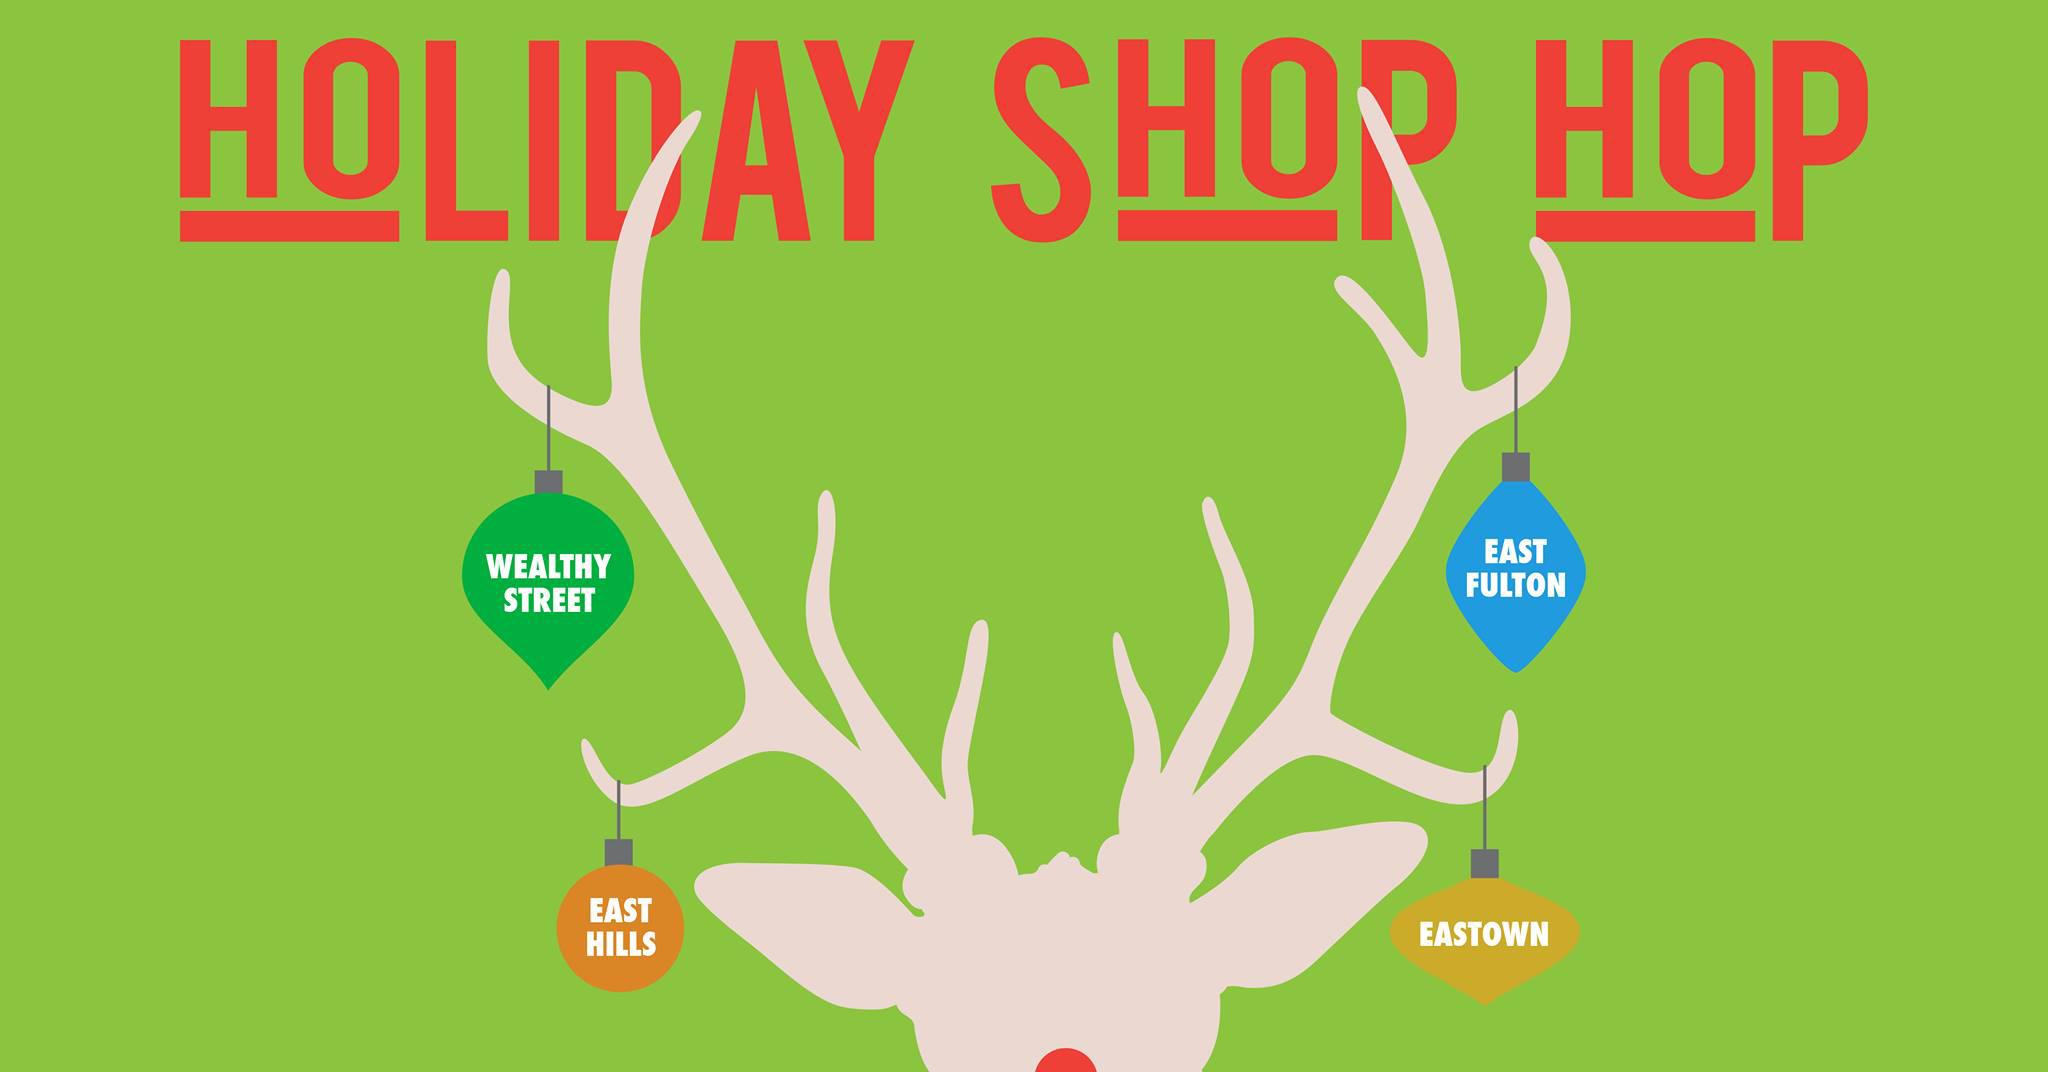 Grand Rapids' Uptown neighborhood hosts annual Holiday Shop Hop.